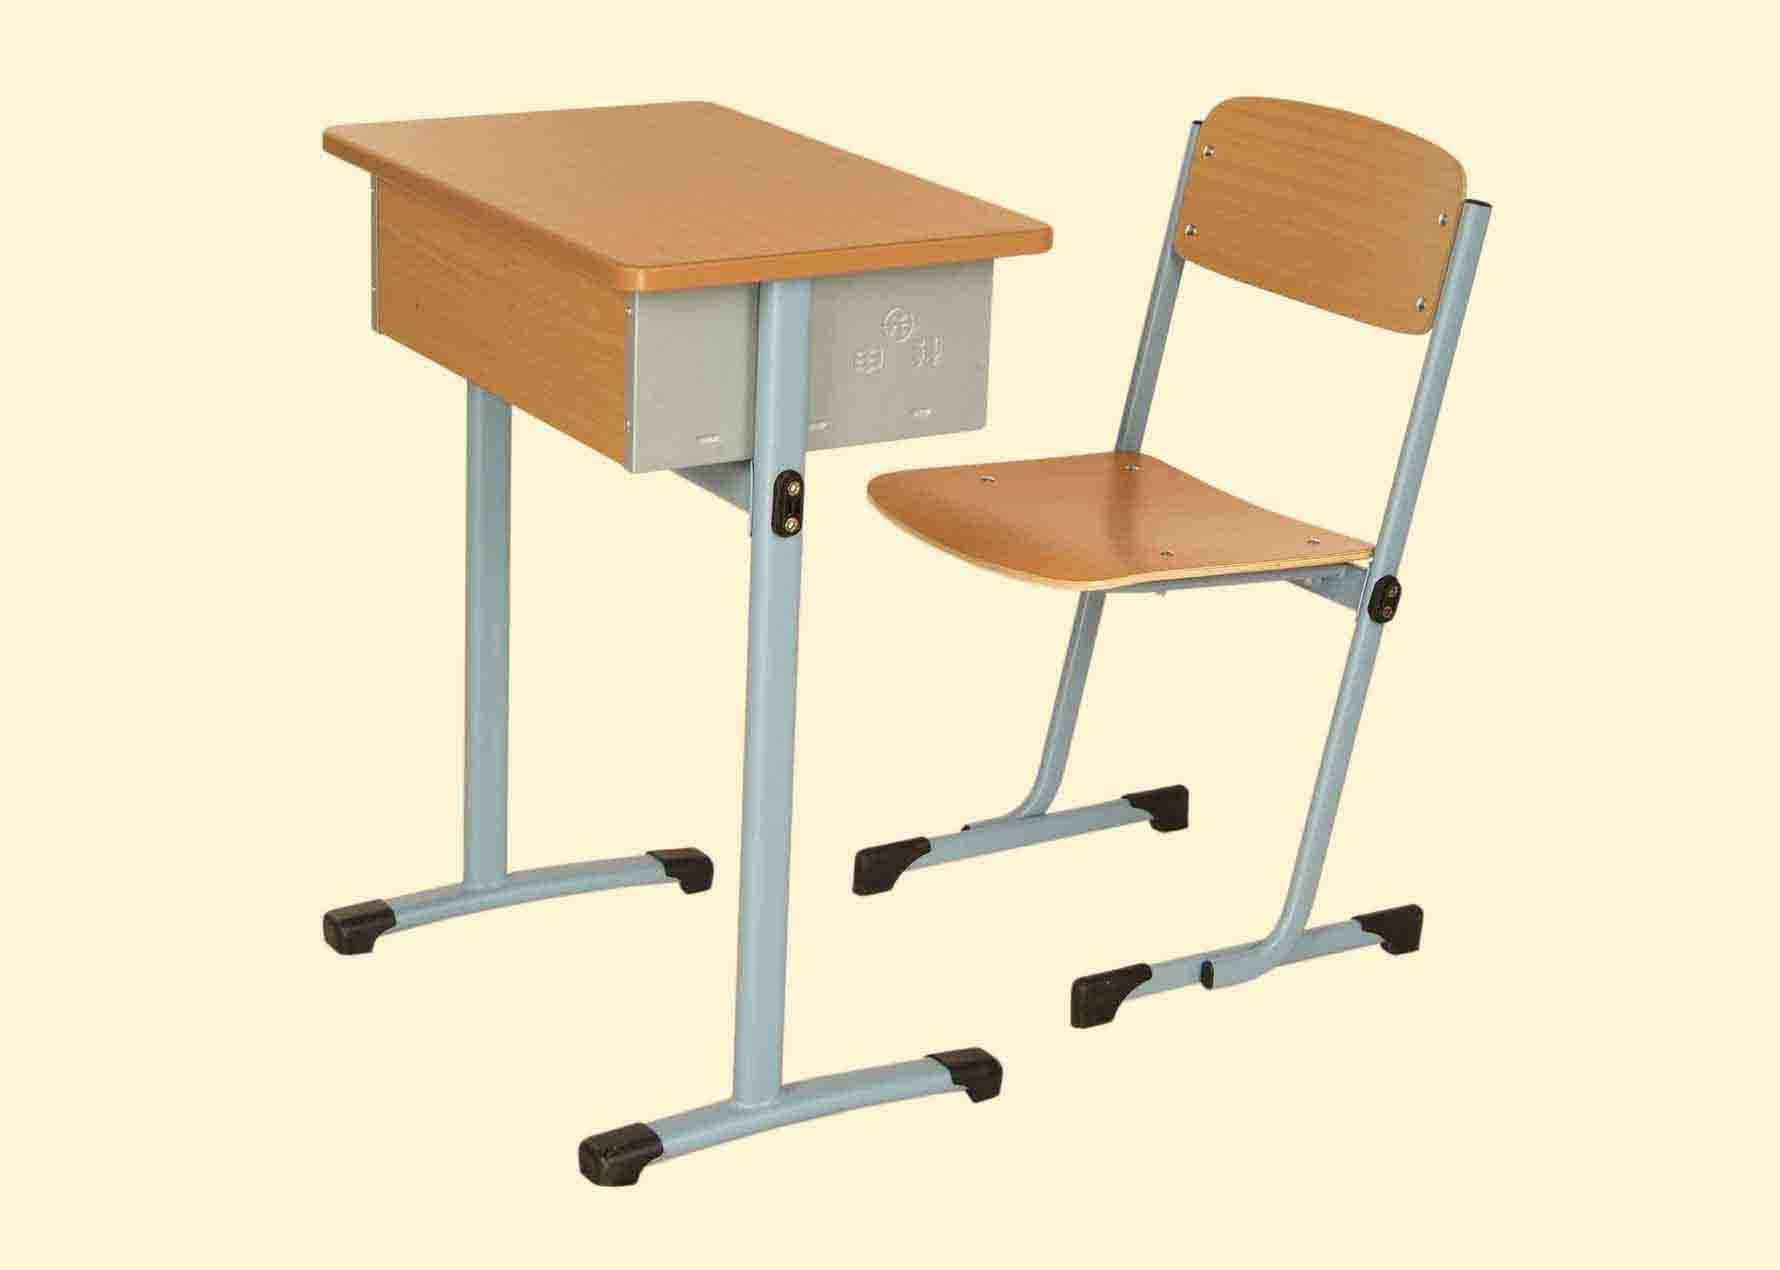 China school desk zgd 27 ygd 16 china school furniture for School furniture from china